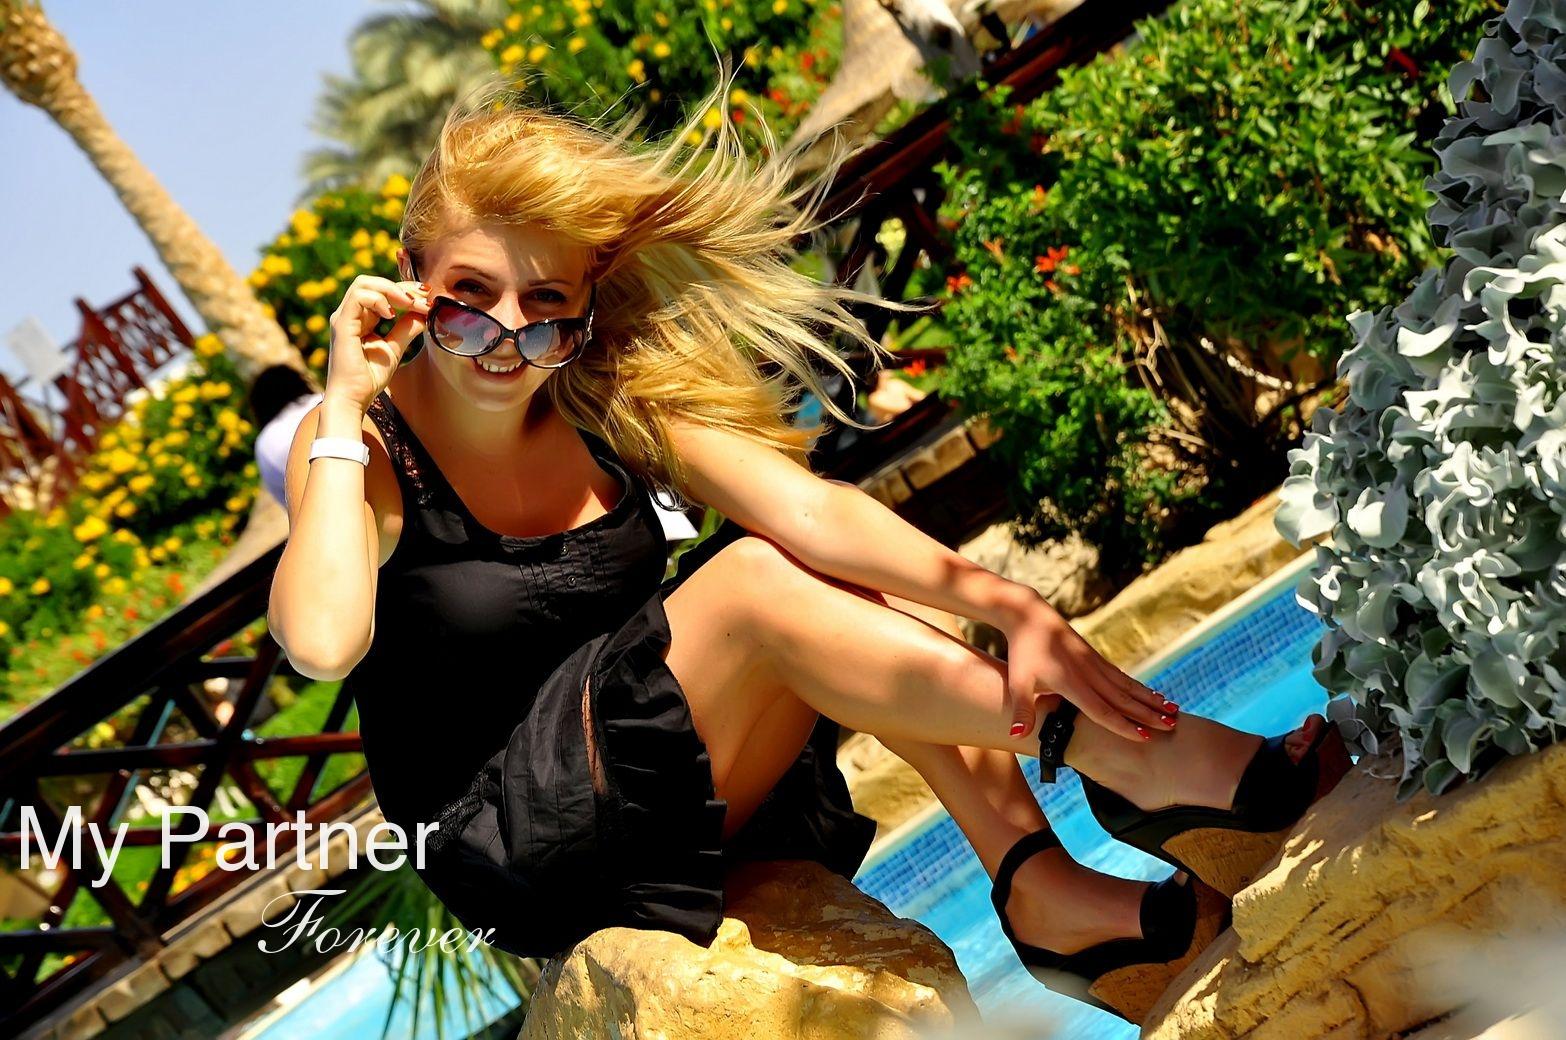 Dating Site to Meet Gorgeous Ukrainian Girl Marina from Kharkov, Ukraine